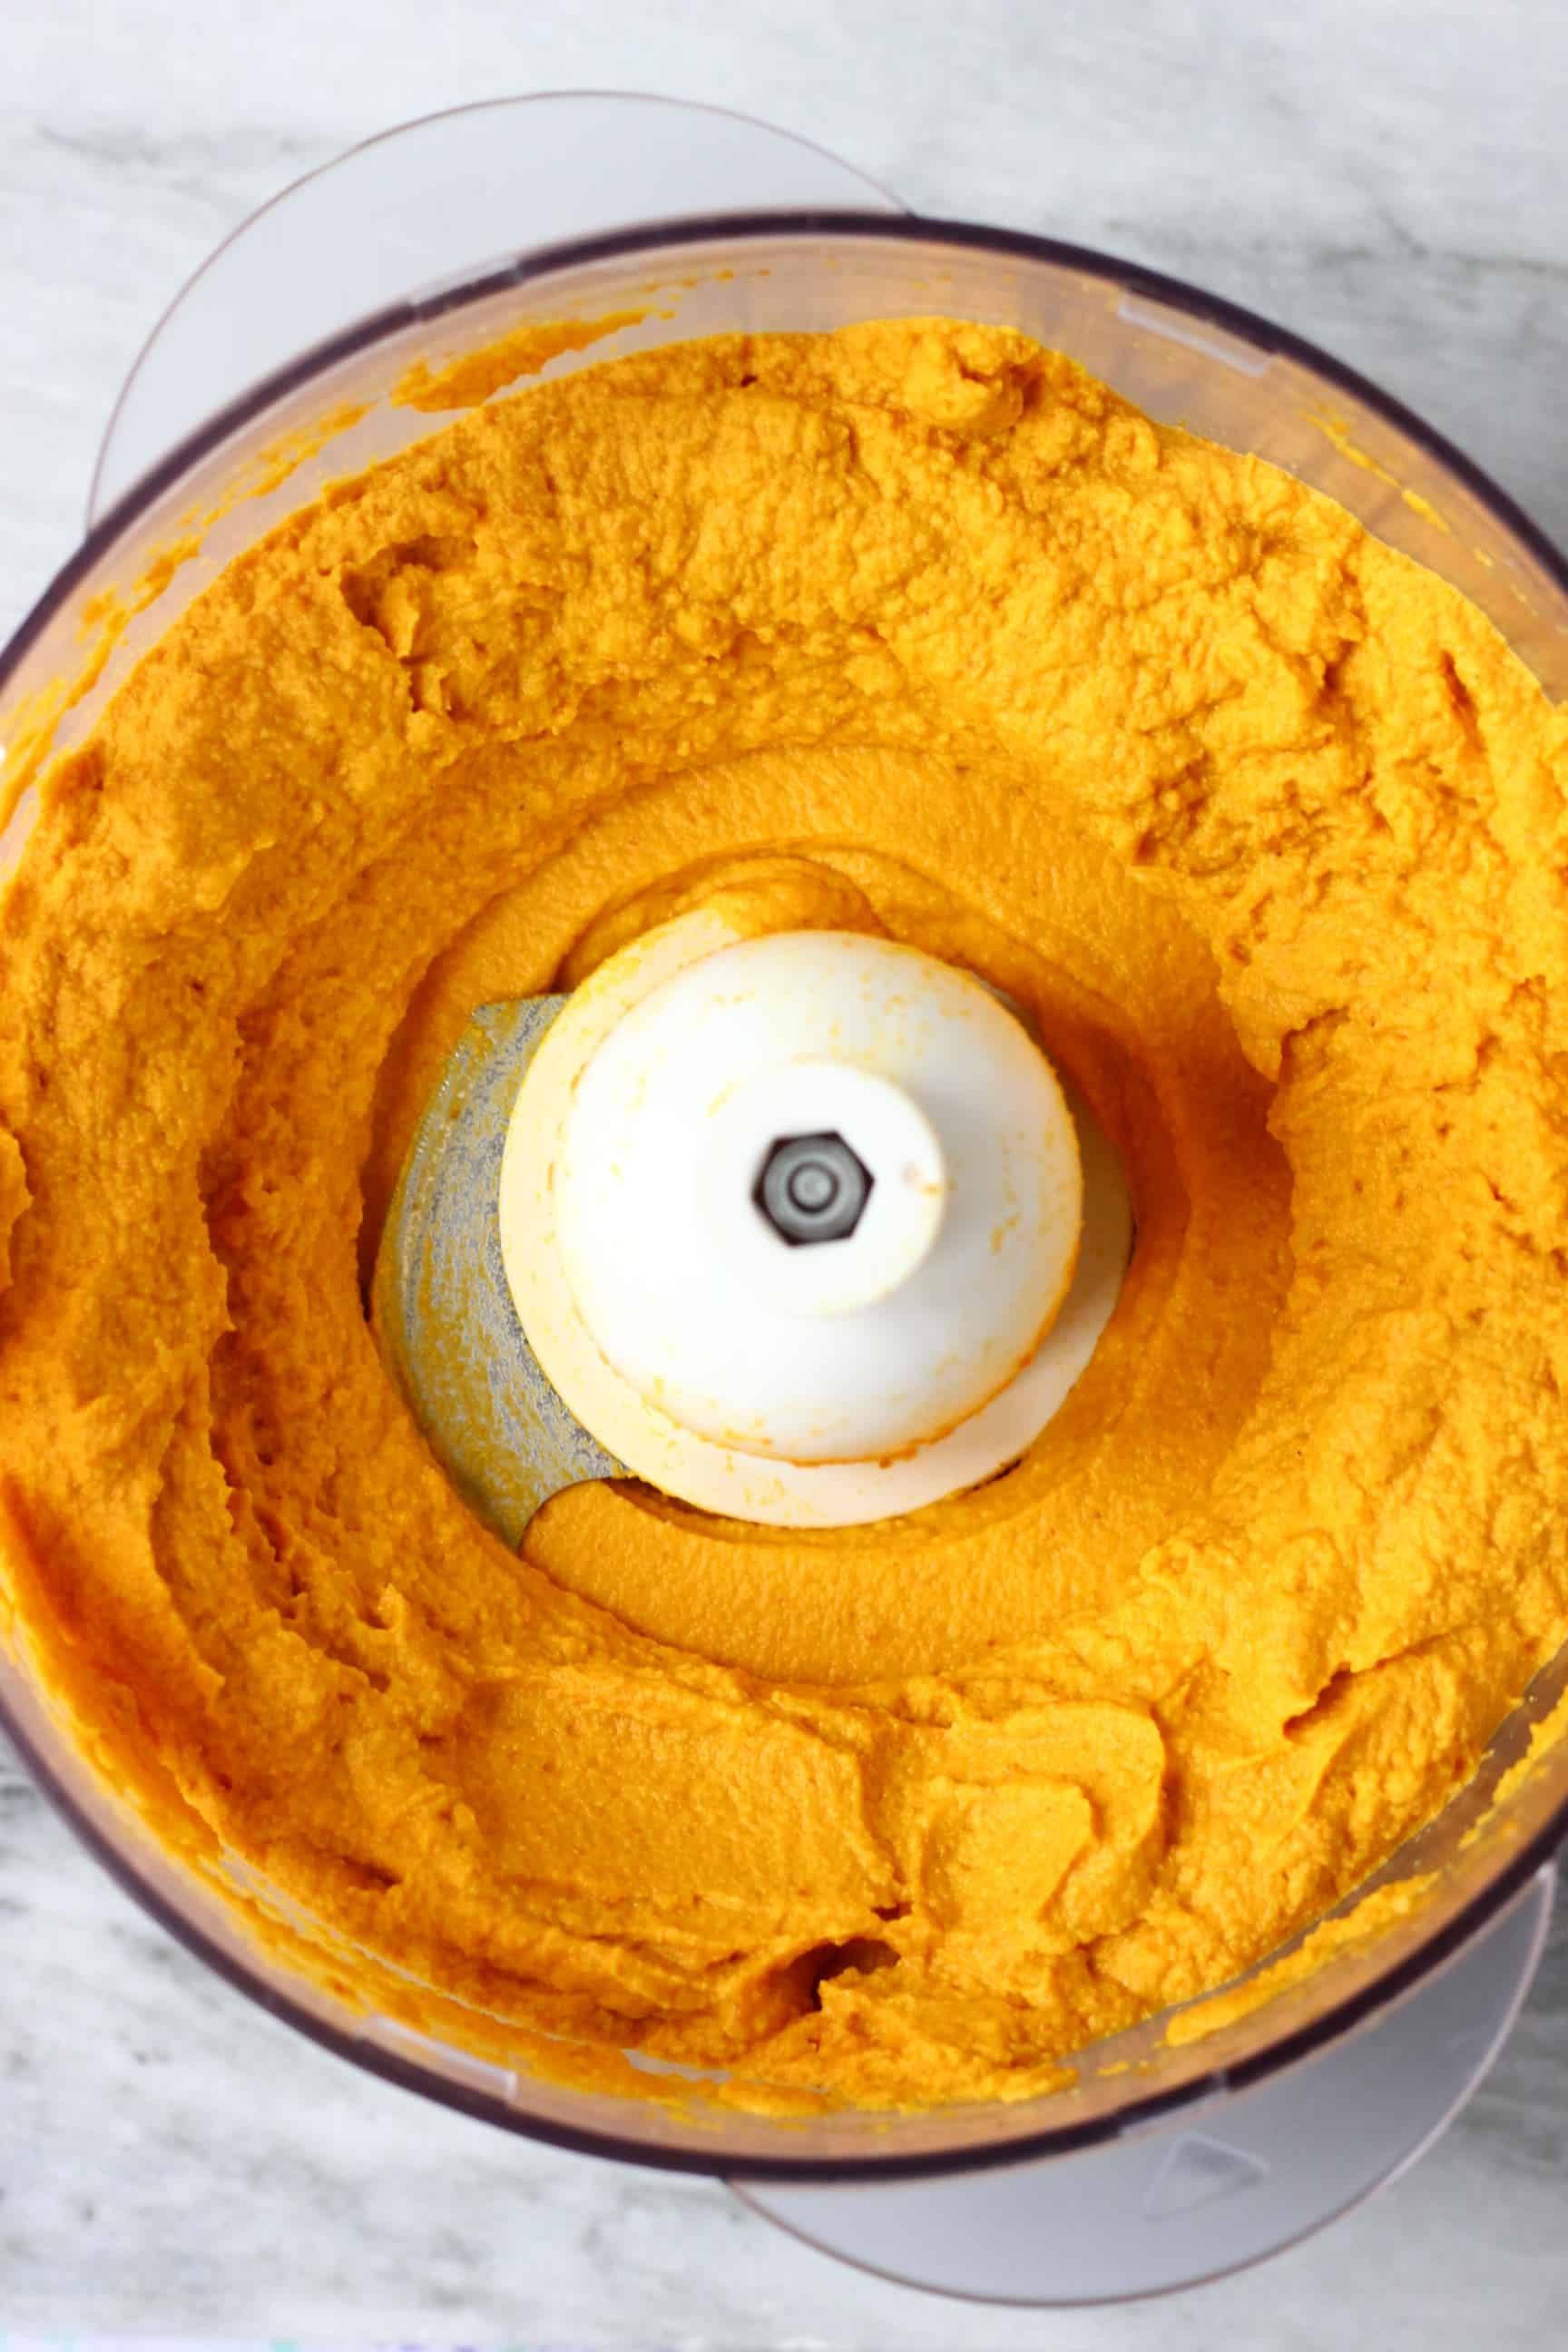 Orange no-bake vegan pumpkin pie filling in a food processor